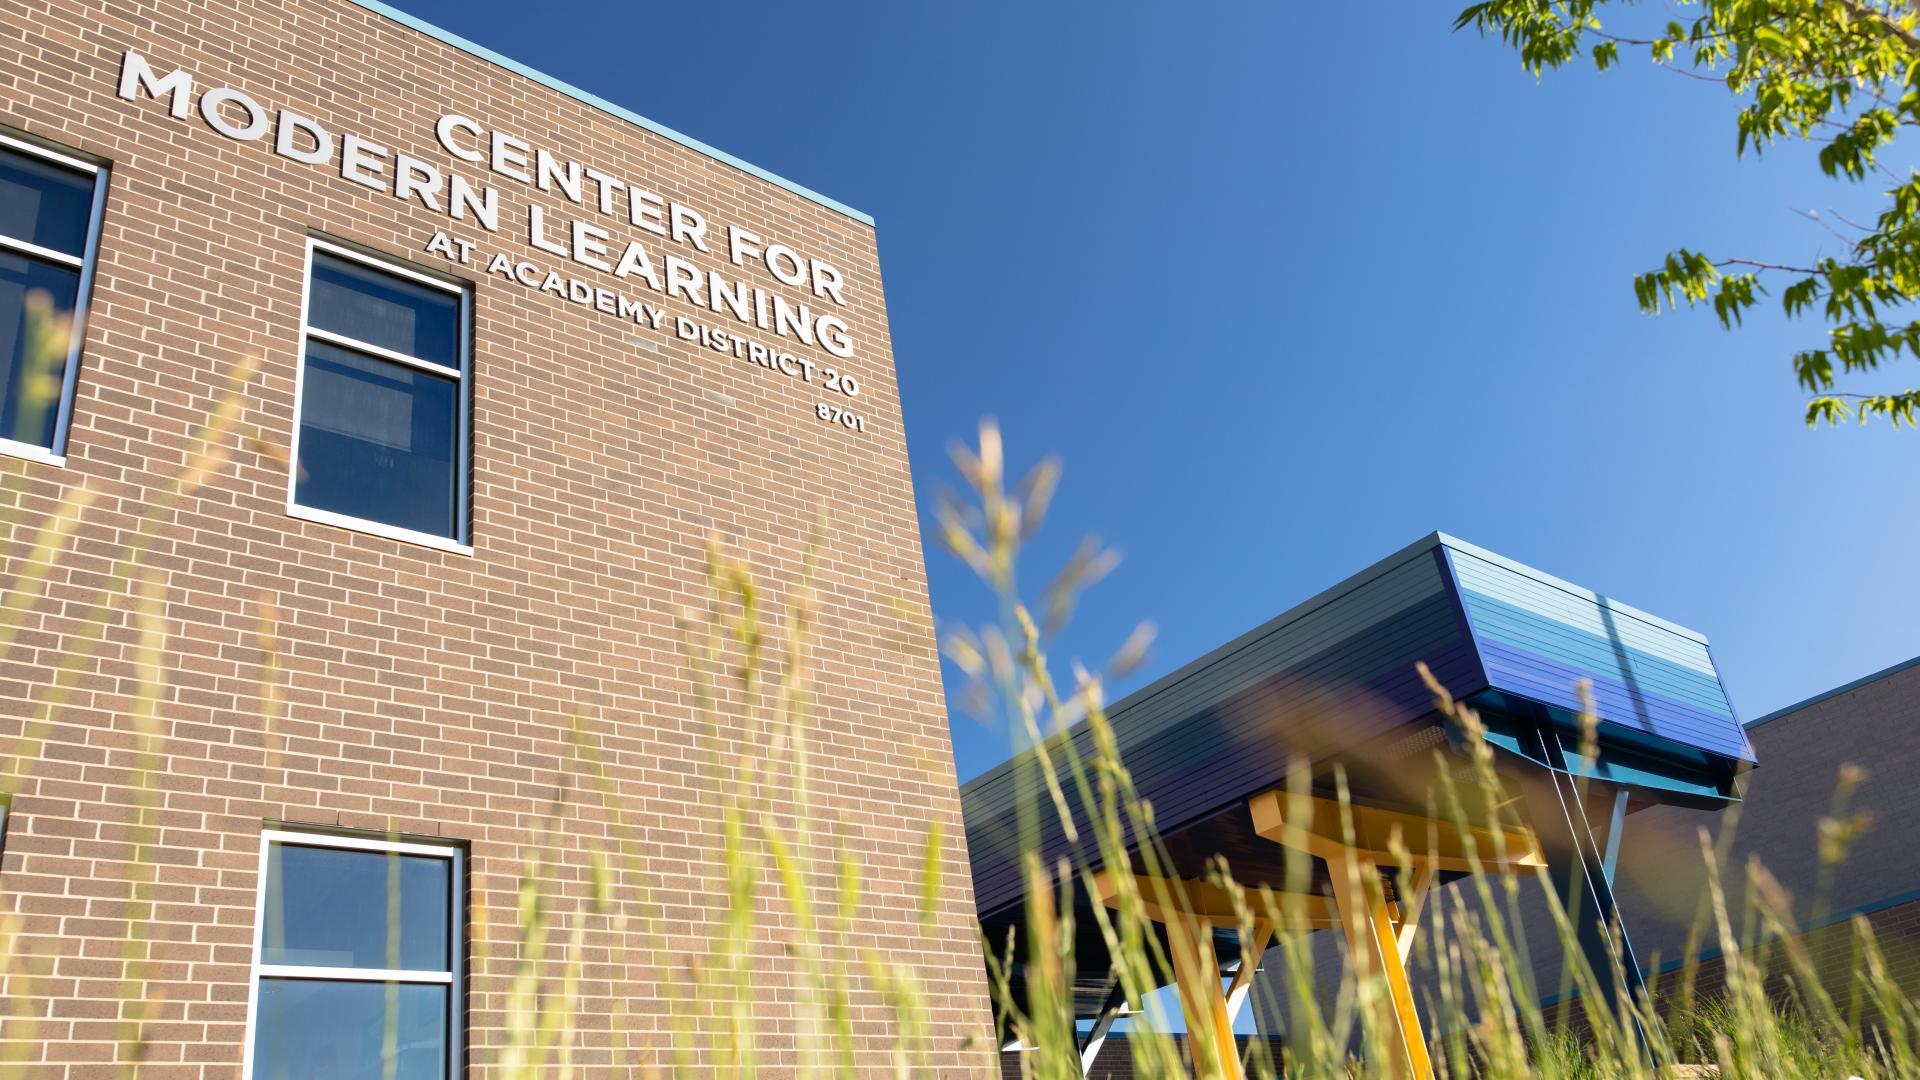 Award-wining schools, hosting Legacy Peak Elementary School and Center for Modern Learning